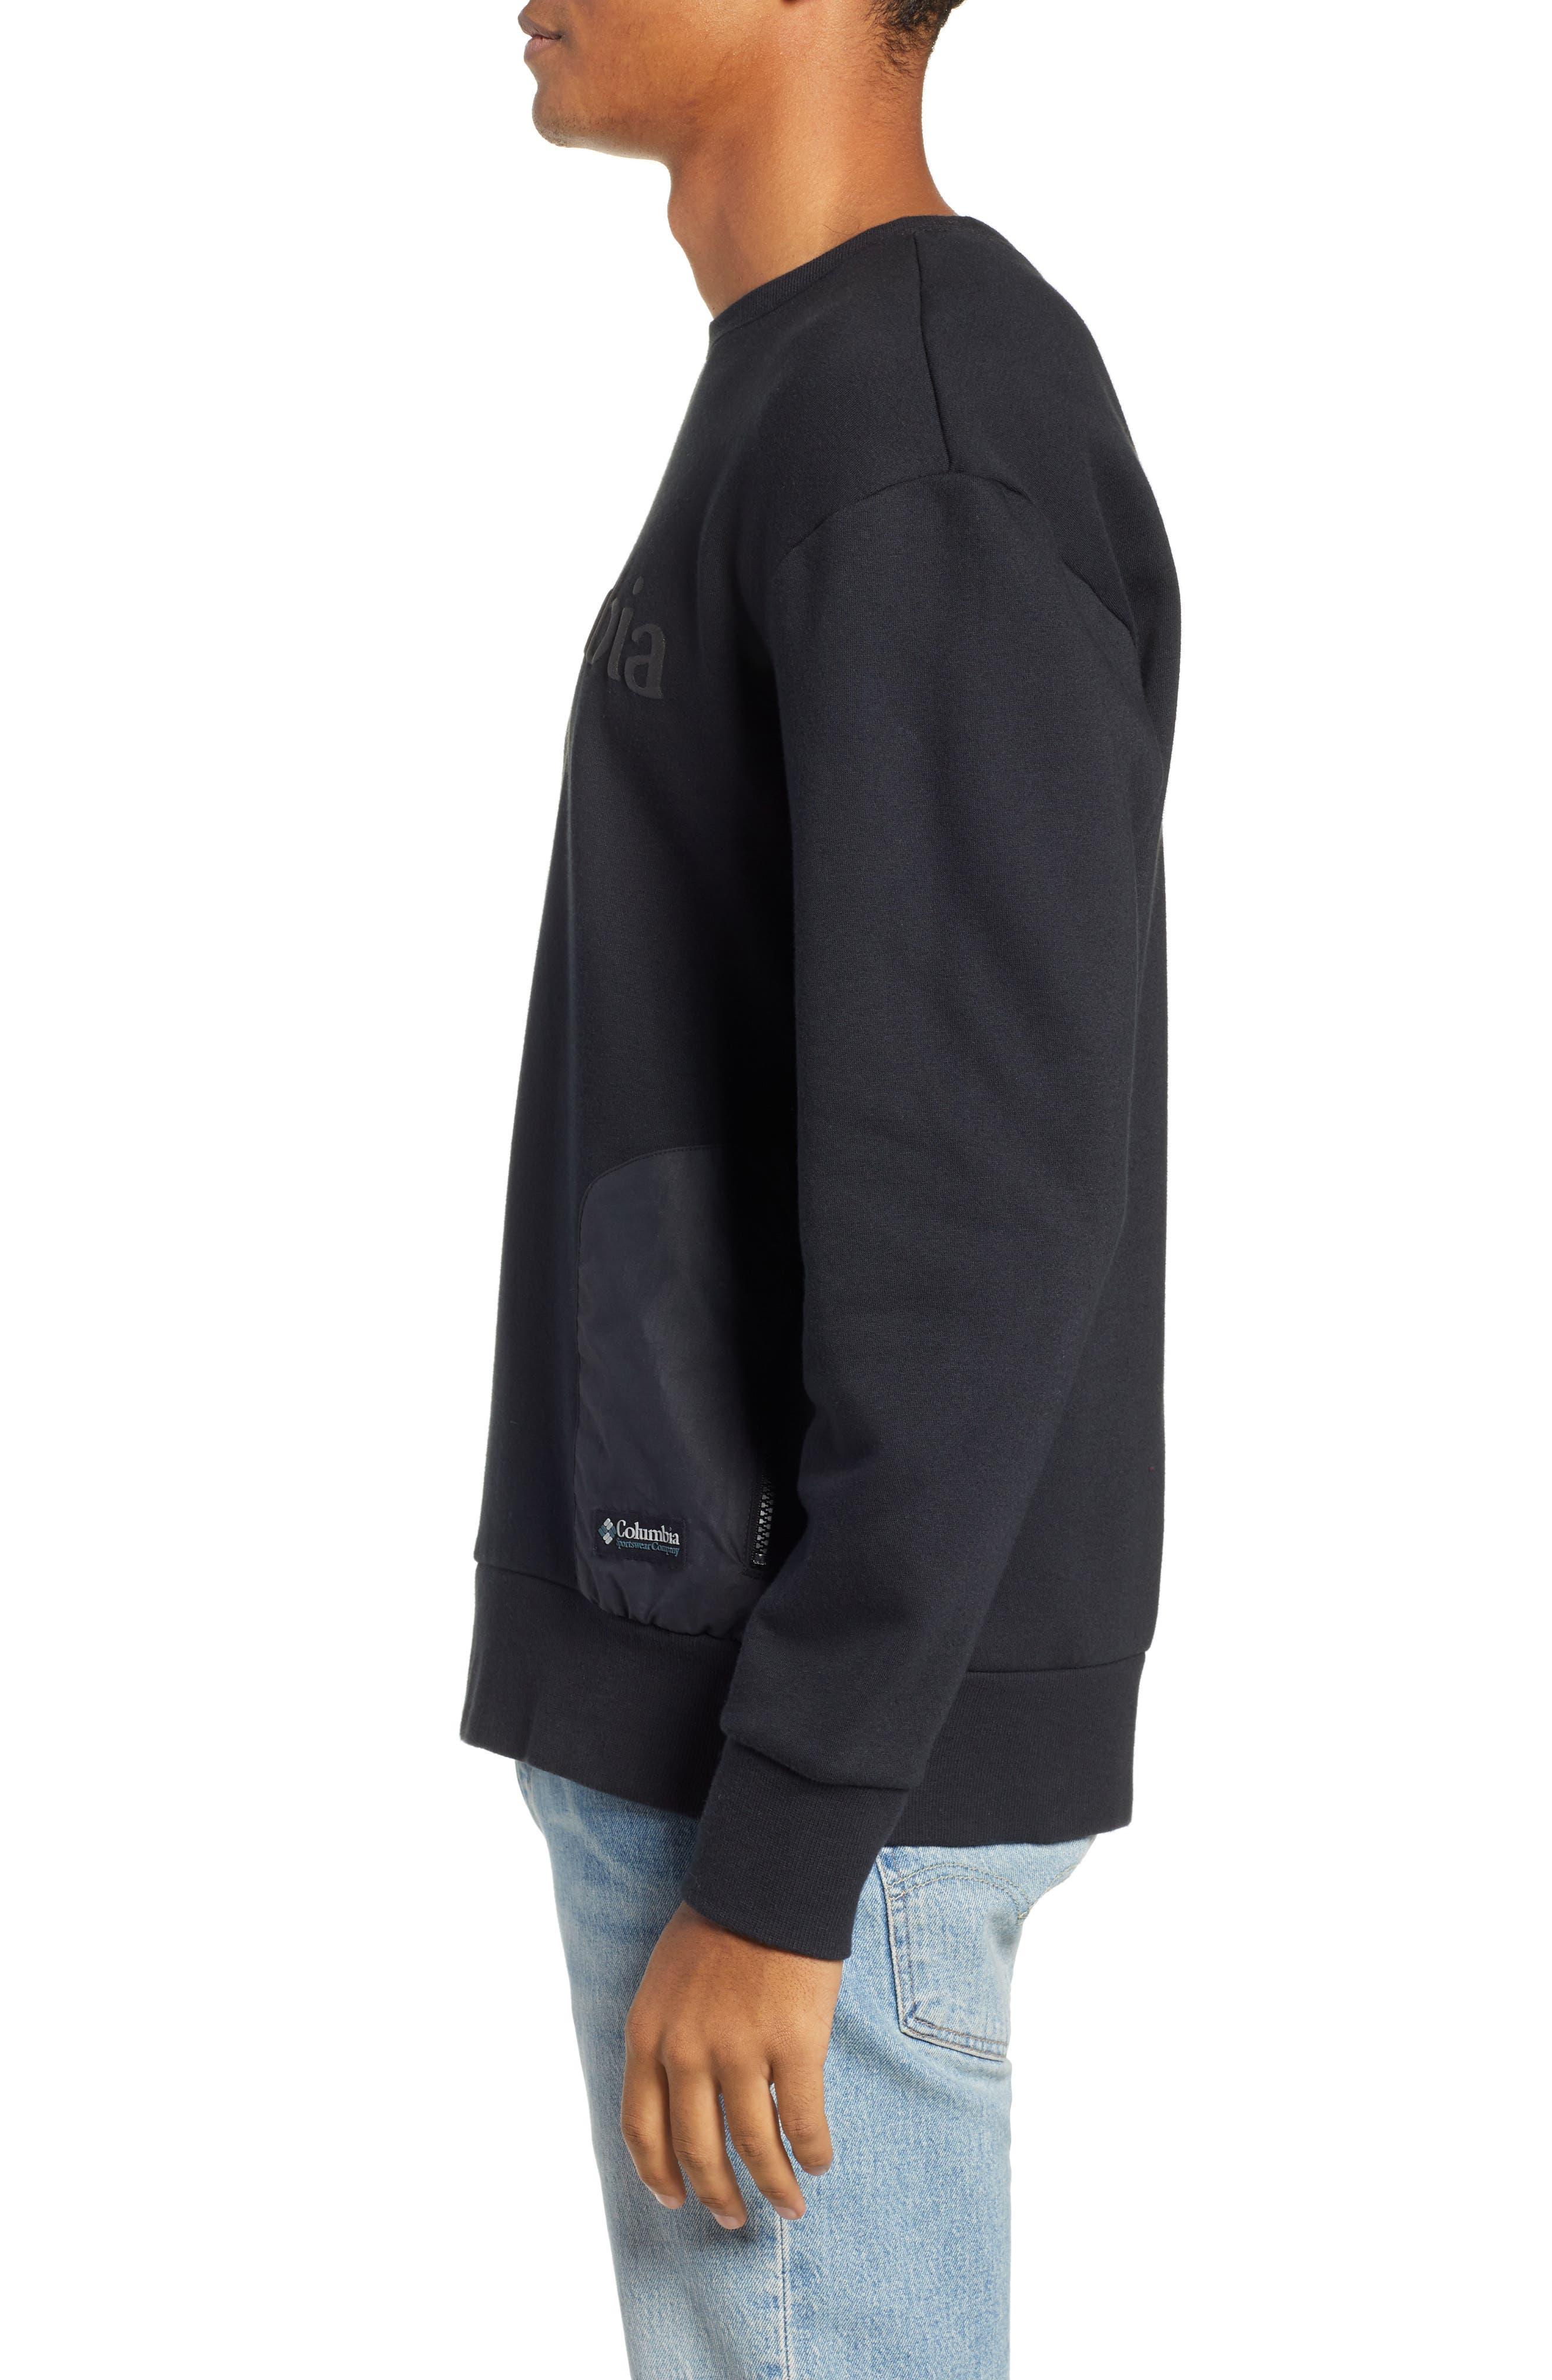 Bugasweat Crewneck Sweatshirt,                             Alternate thumbnail 3, color,                             BLACK